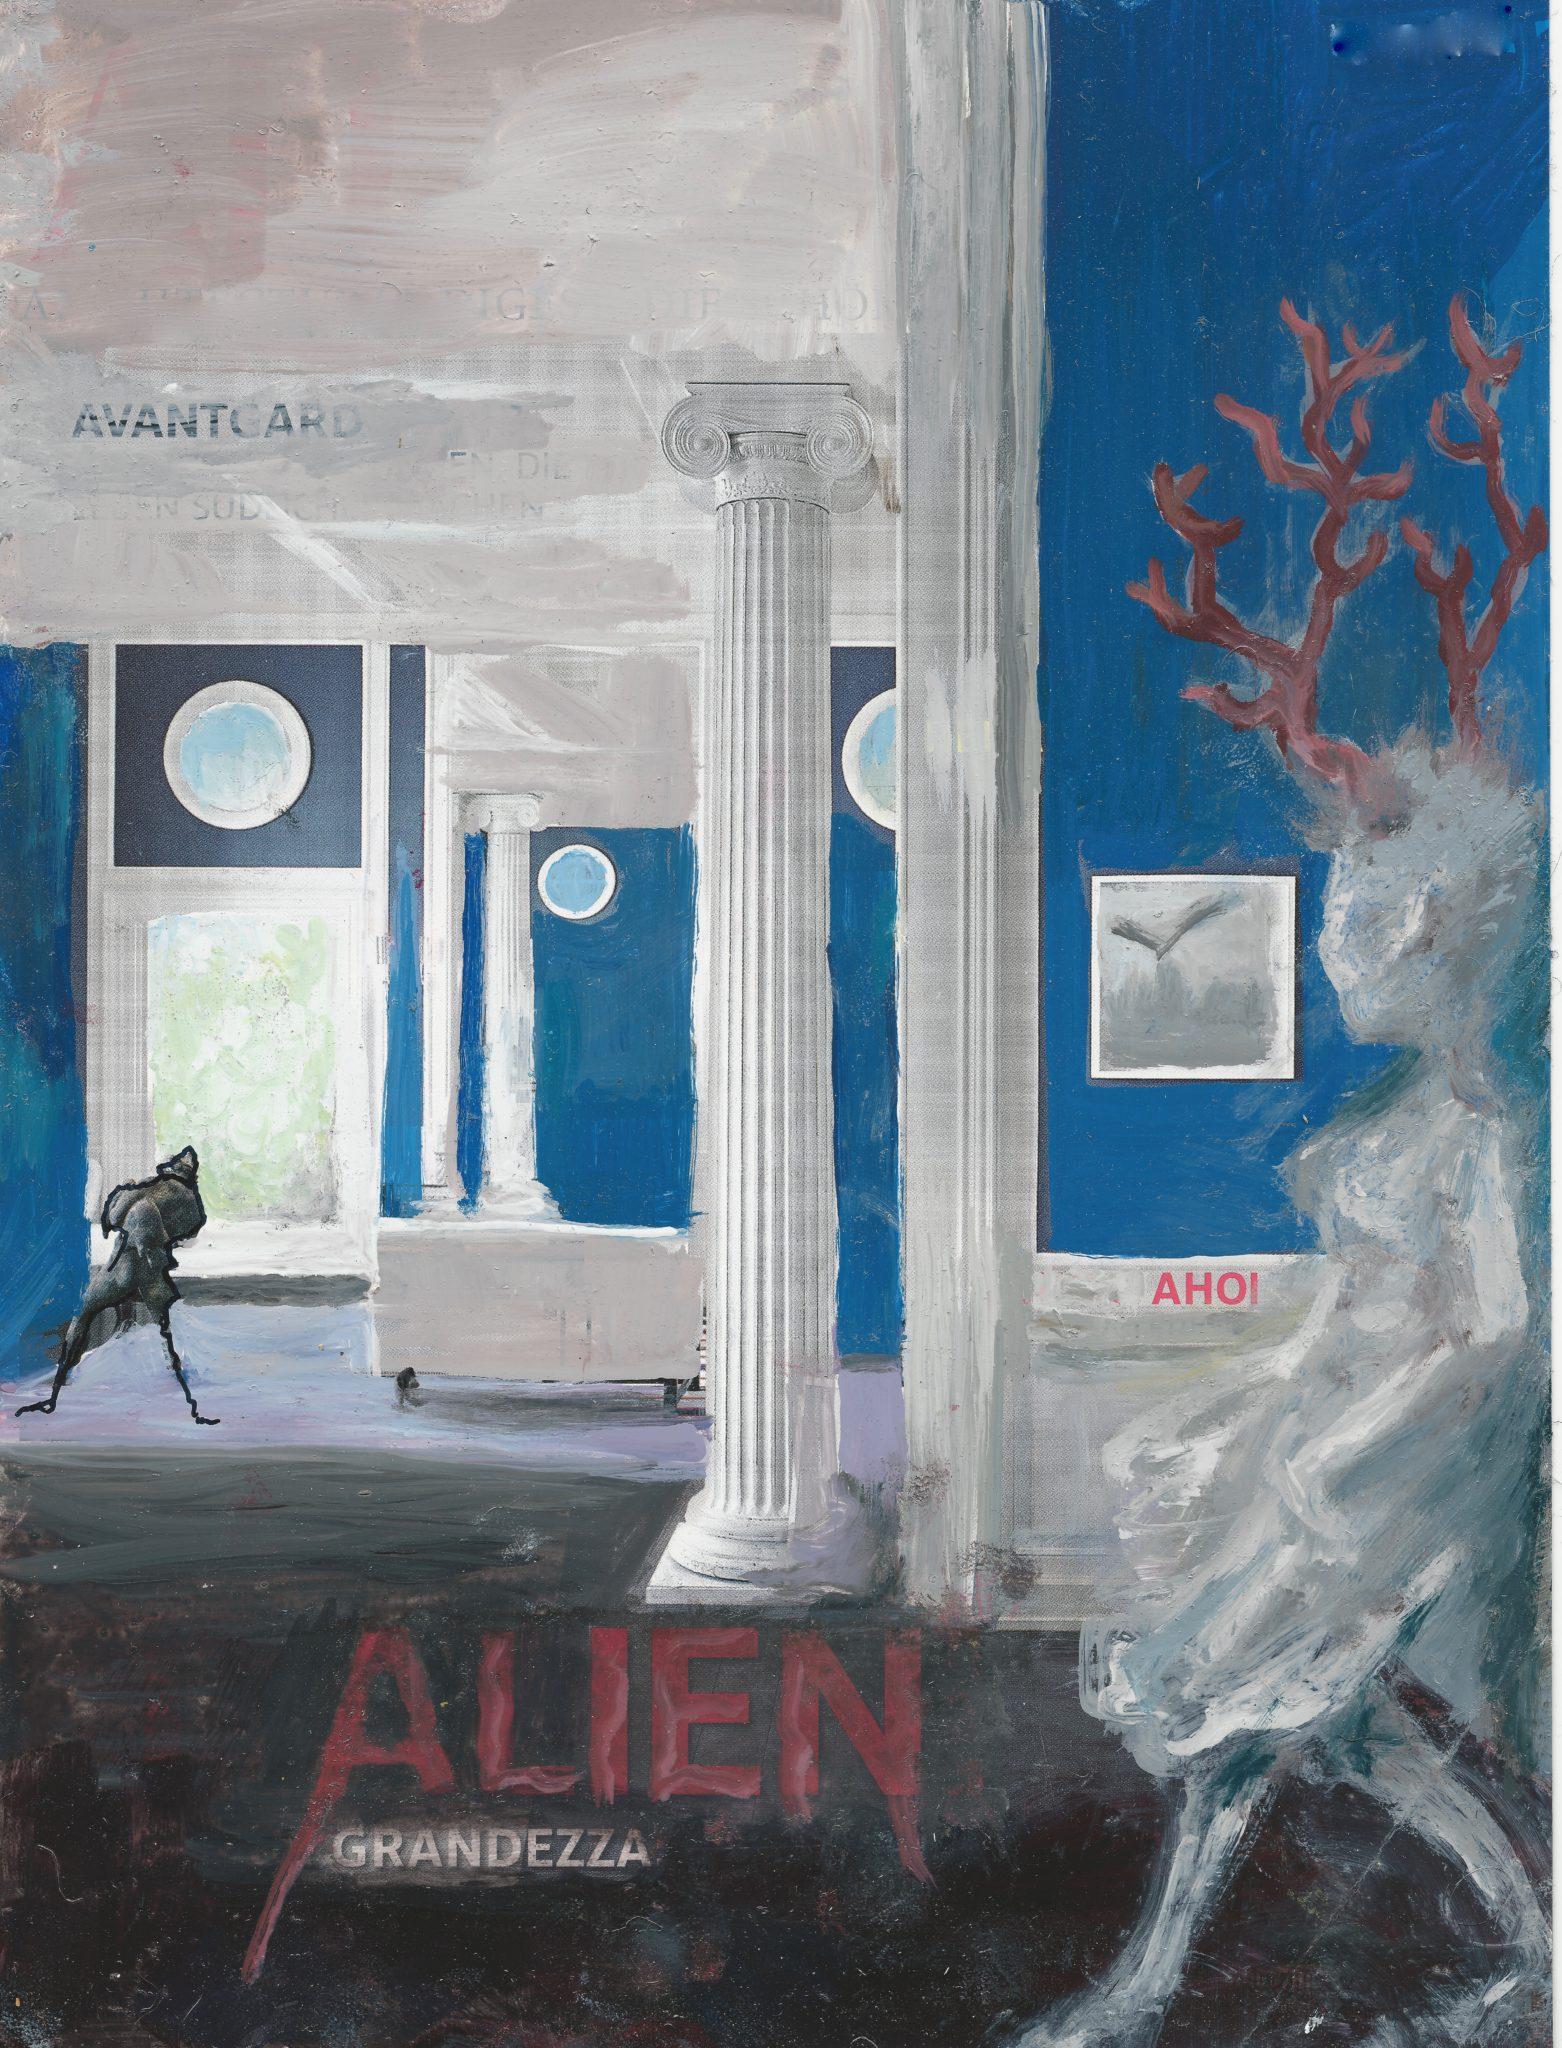 Ahoi Alien